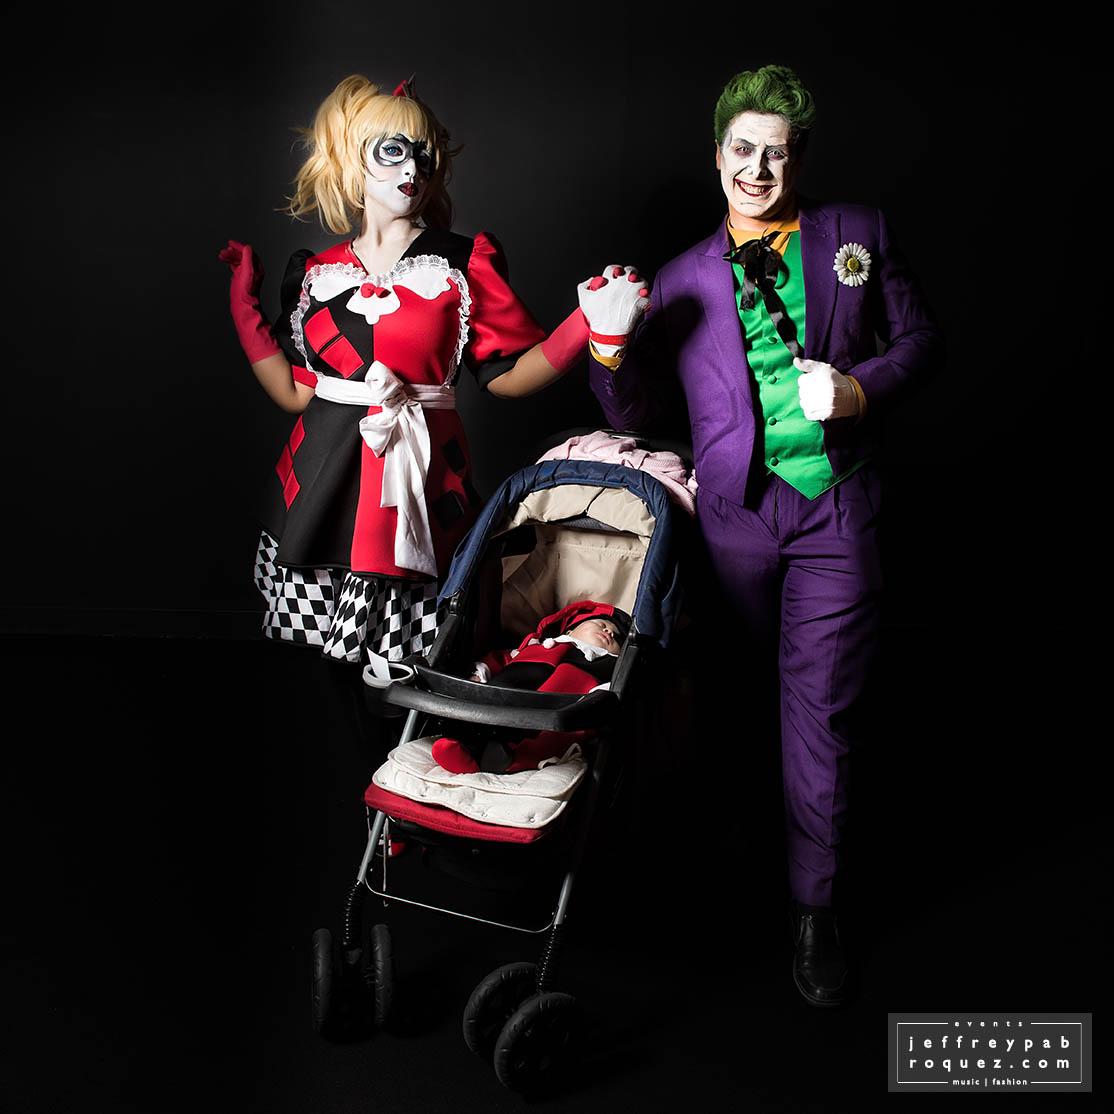 Joker & The Harley Quinns